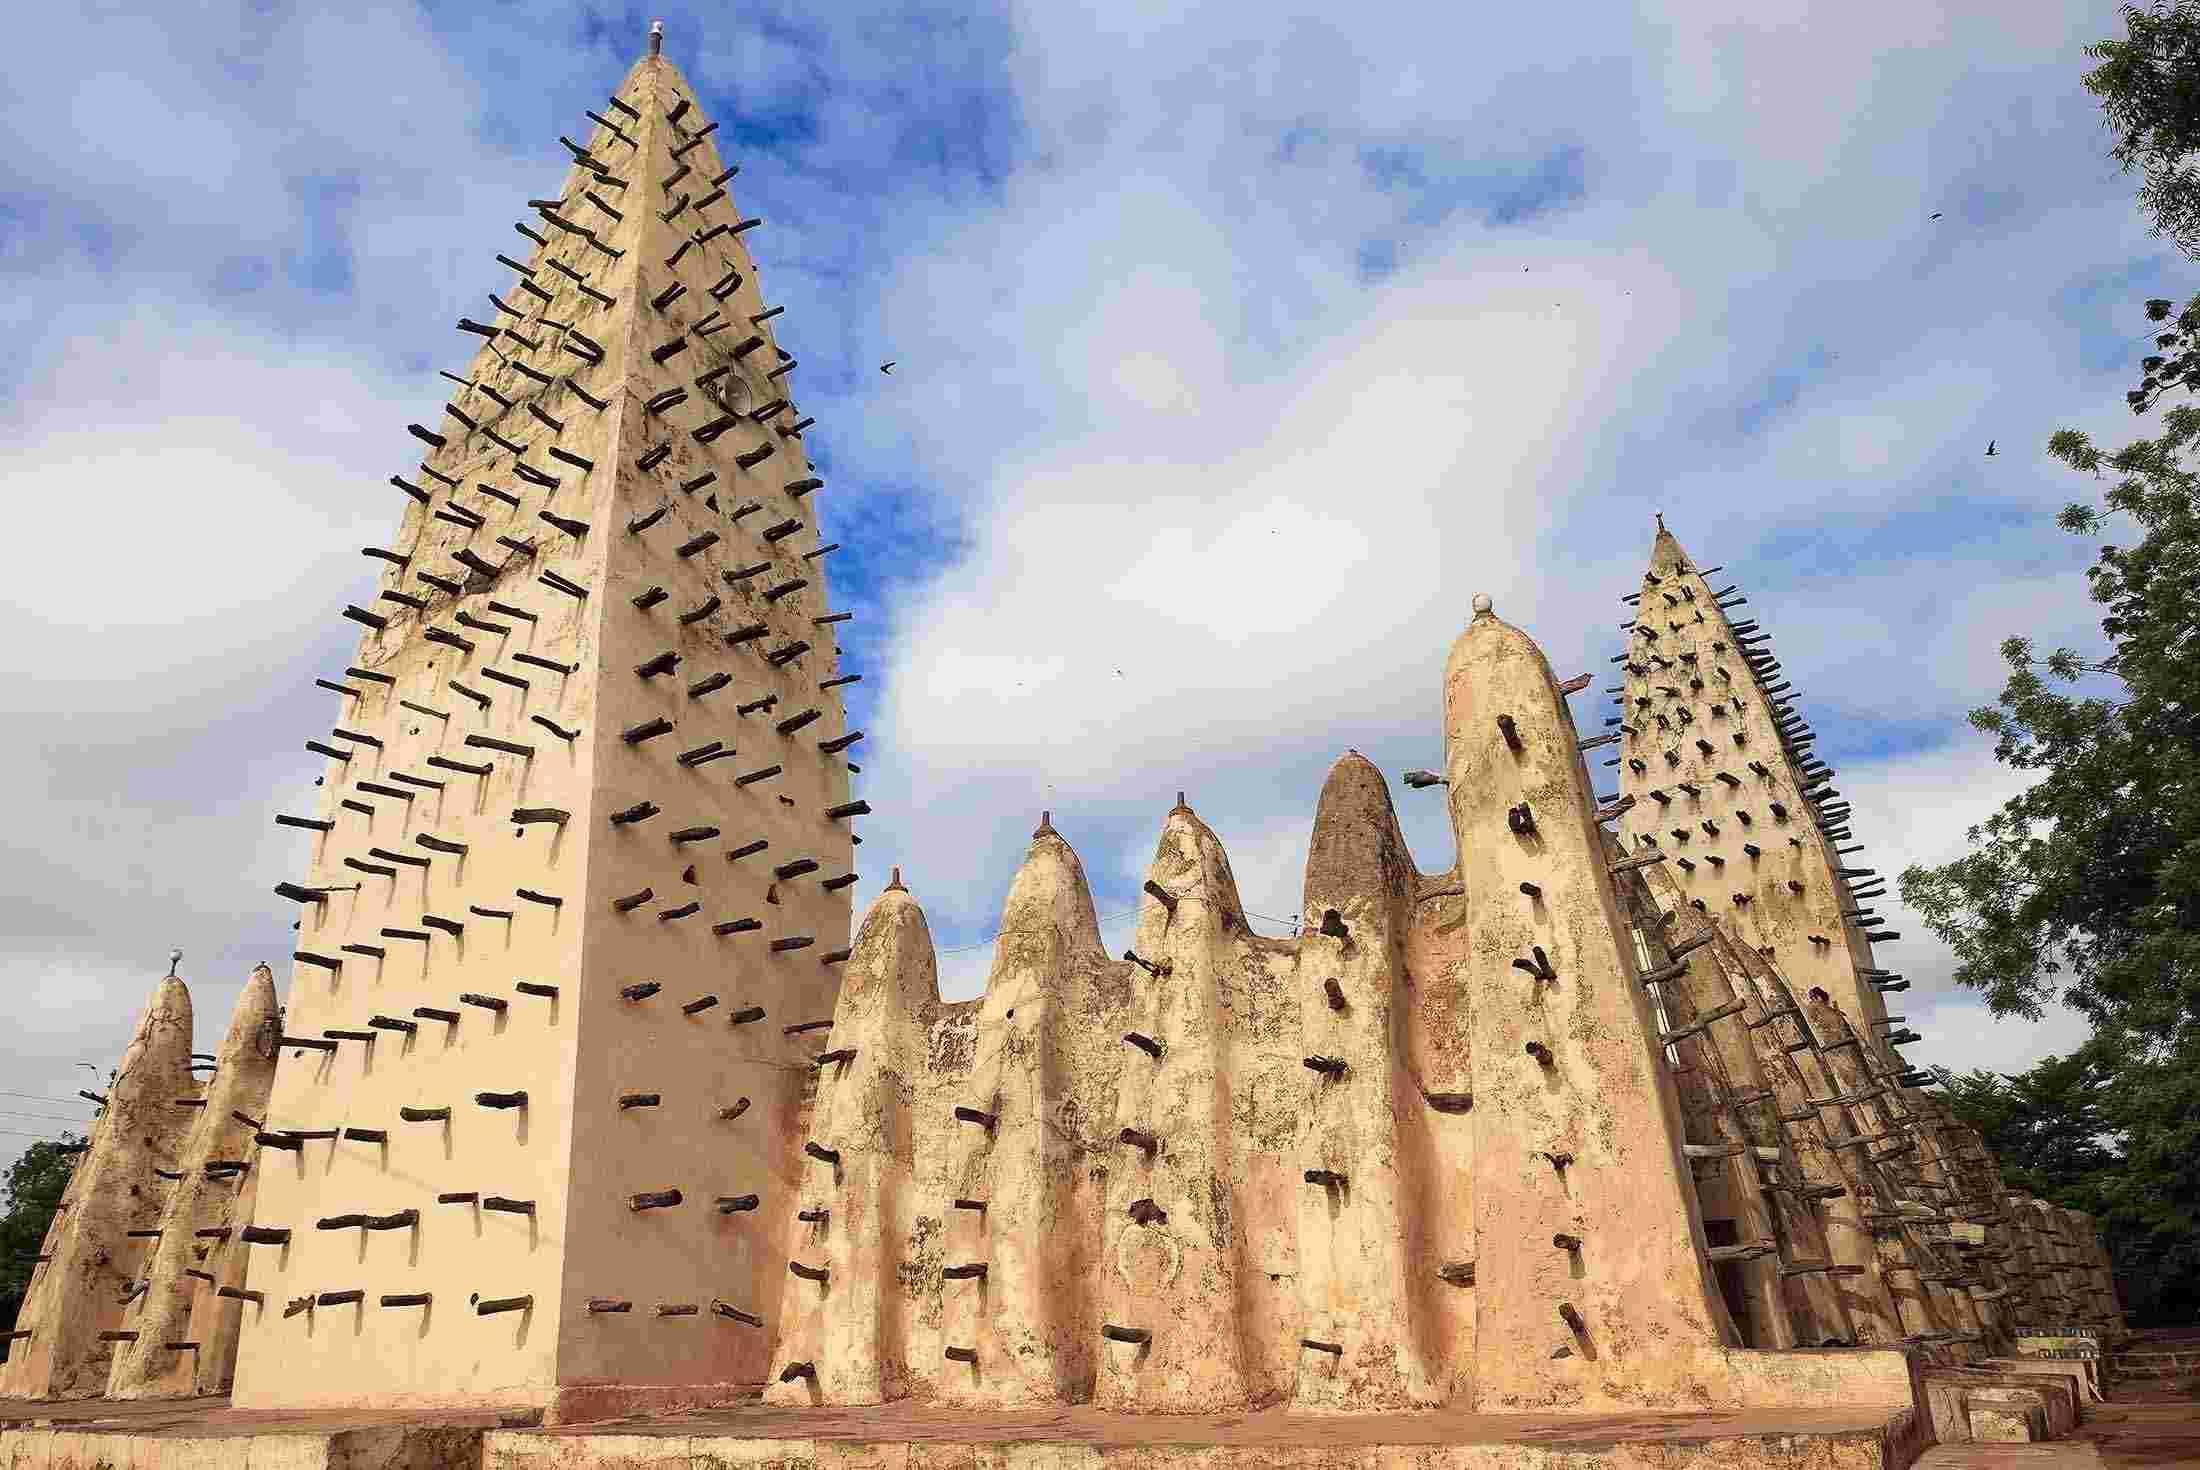 Is Burkina Faso Safe to Visit?